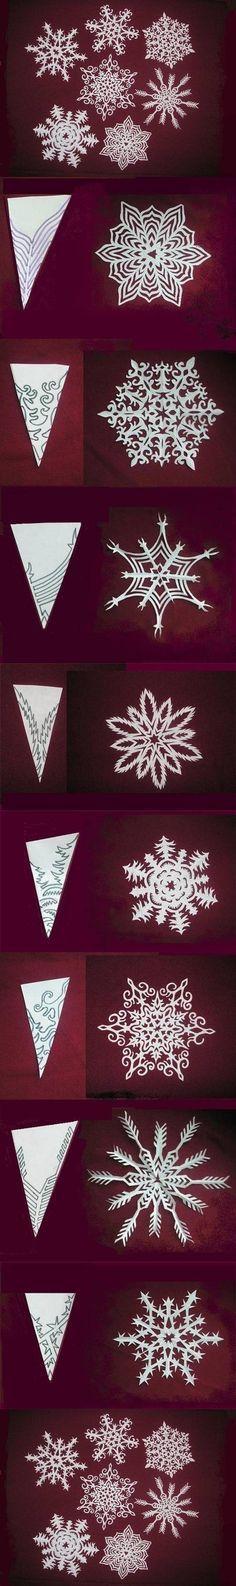 A noi i cristalli di neve piacciono troppo! DIY Snowflakes Paper Pattern Tutorial via usefuldiy.com